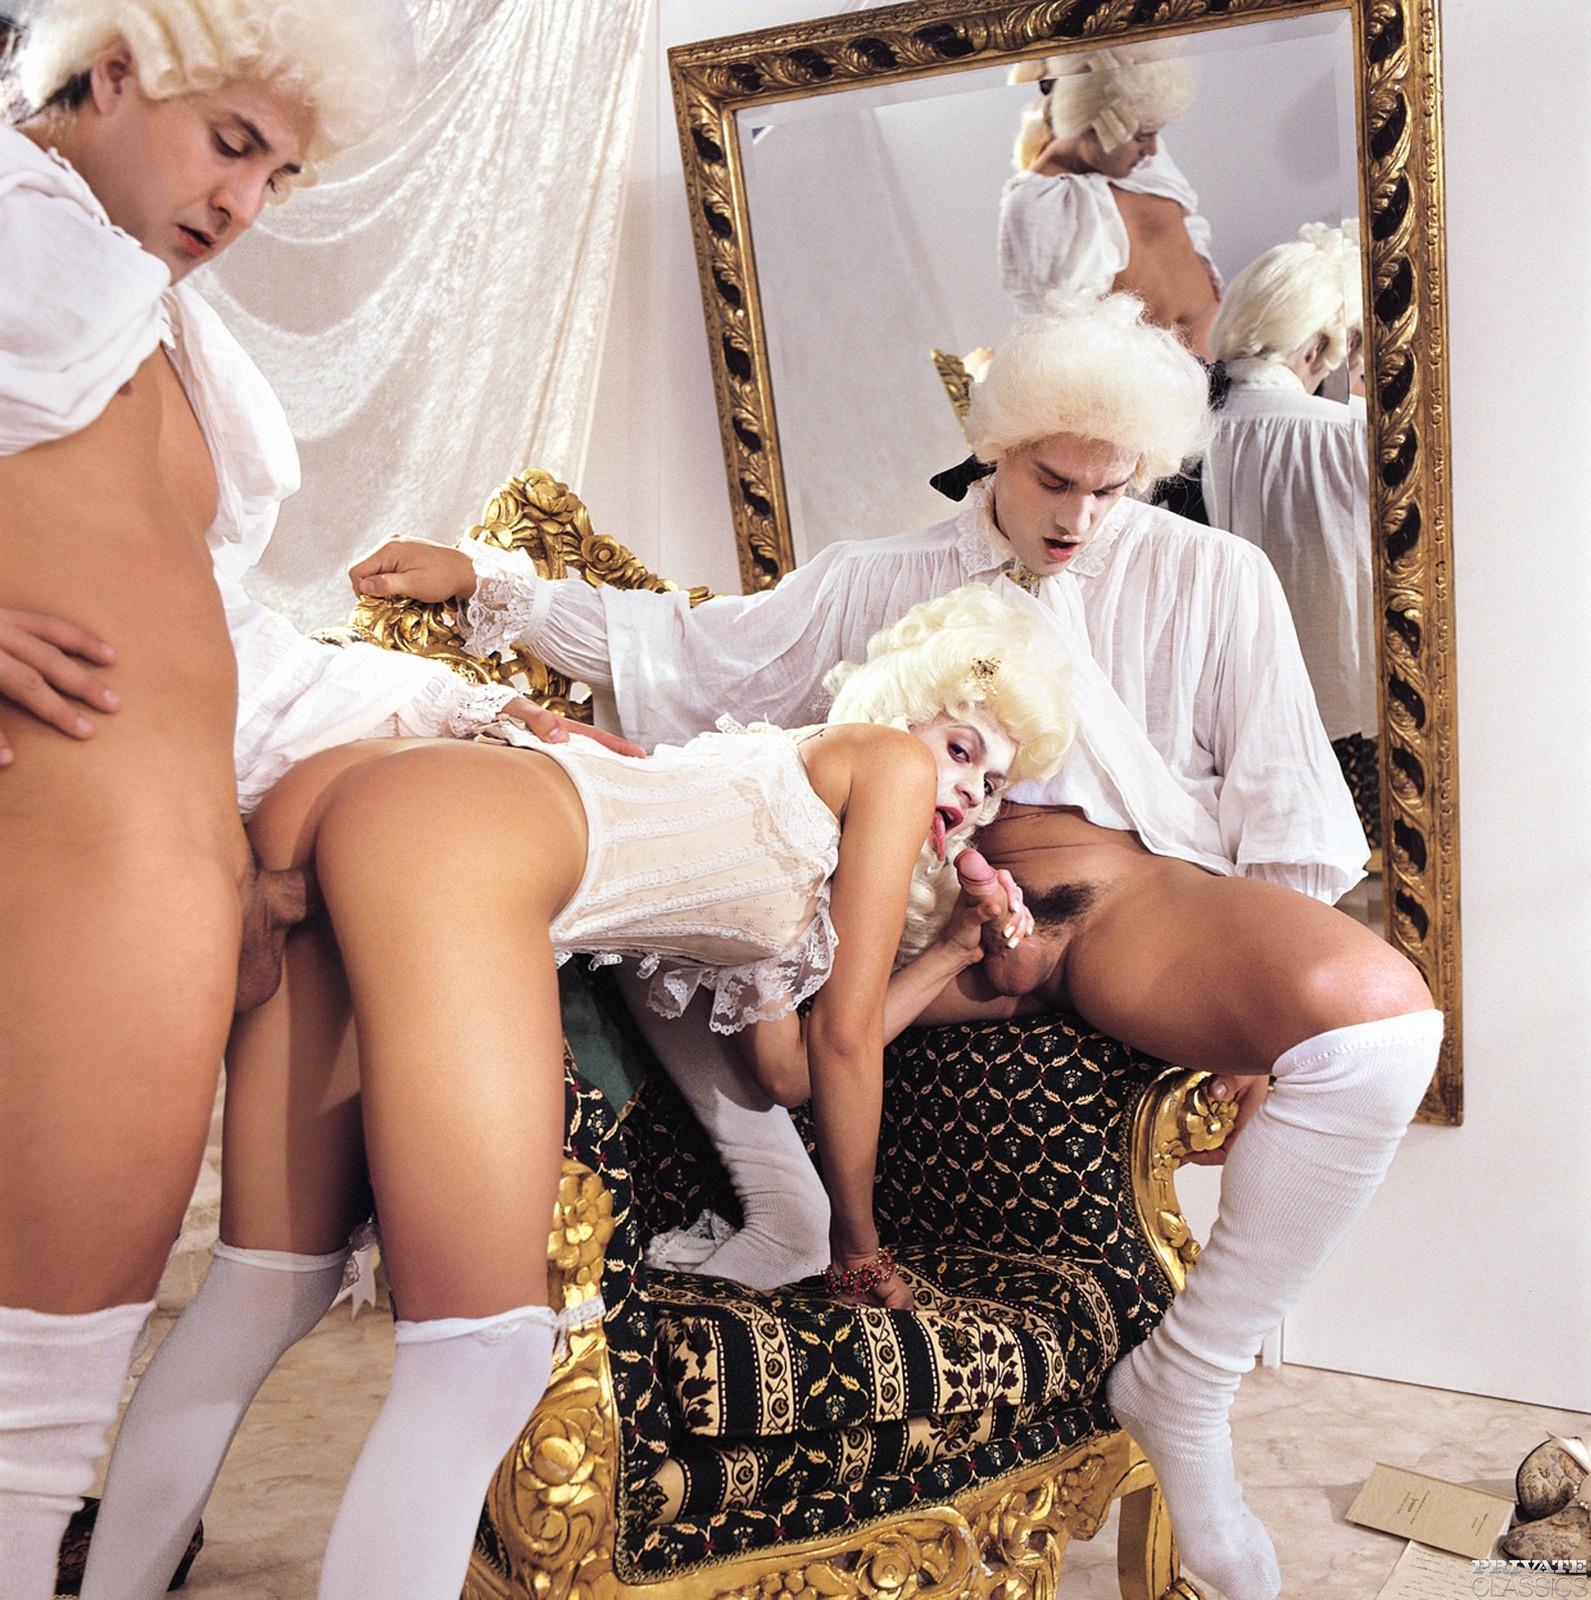 katalog-russkie-porno-trah-v-vintazhnih-platyah-v-karete-porno